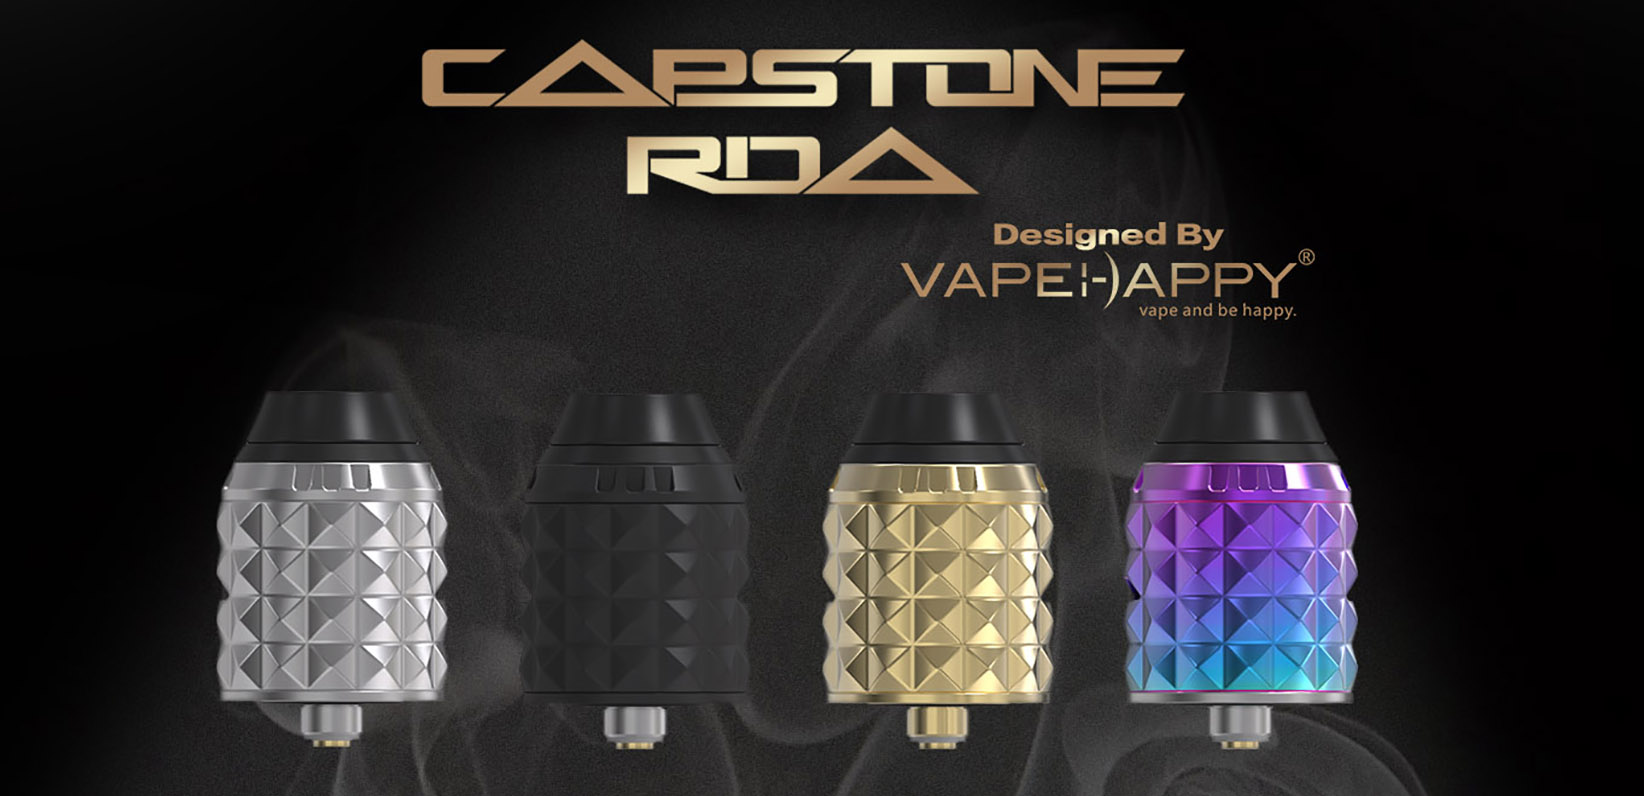 Vandy_Vape_Capstone_RDA-1.jpg